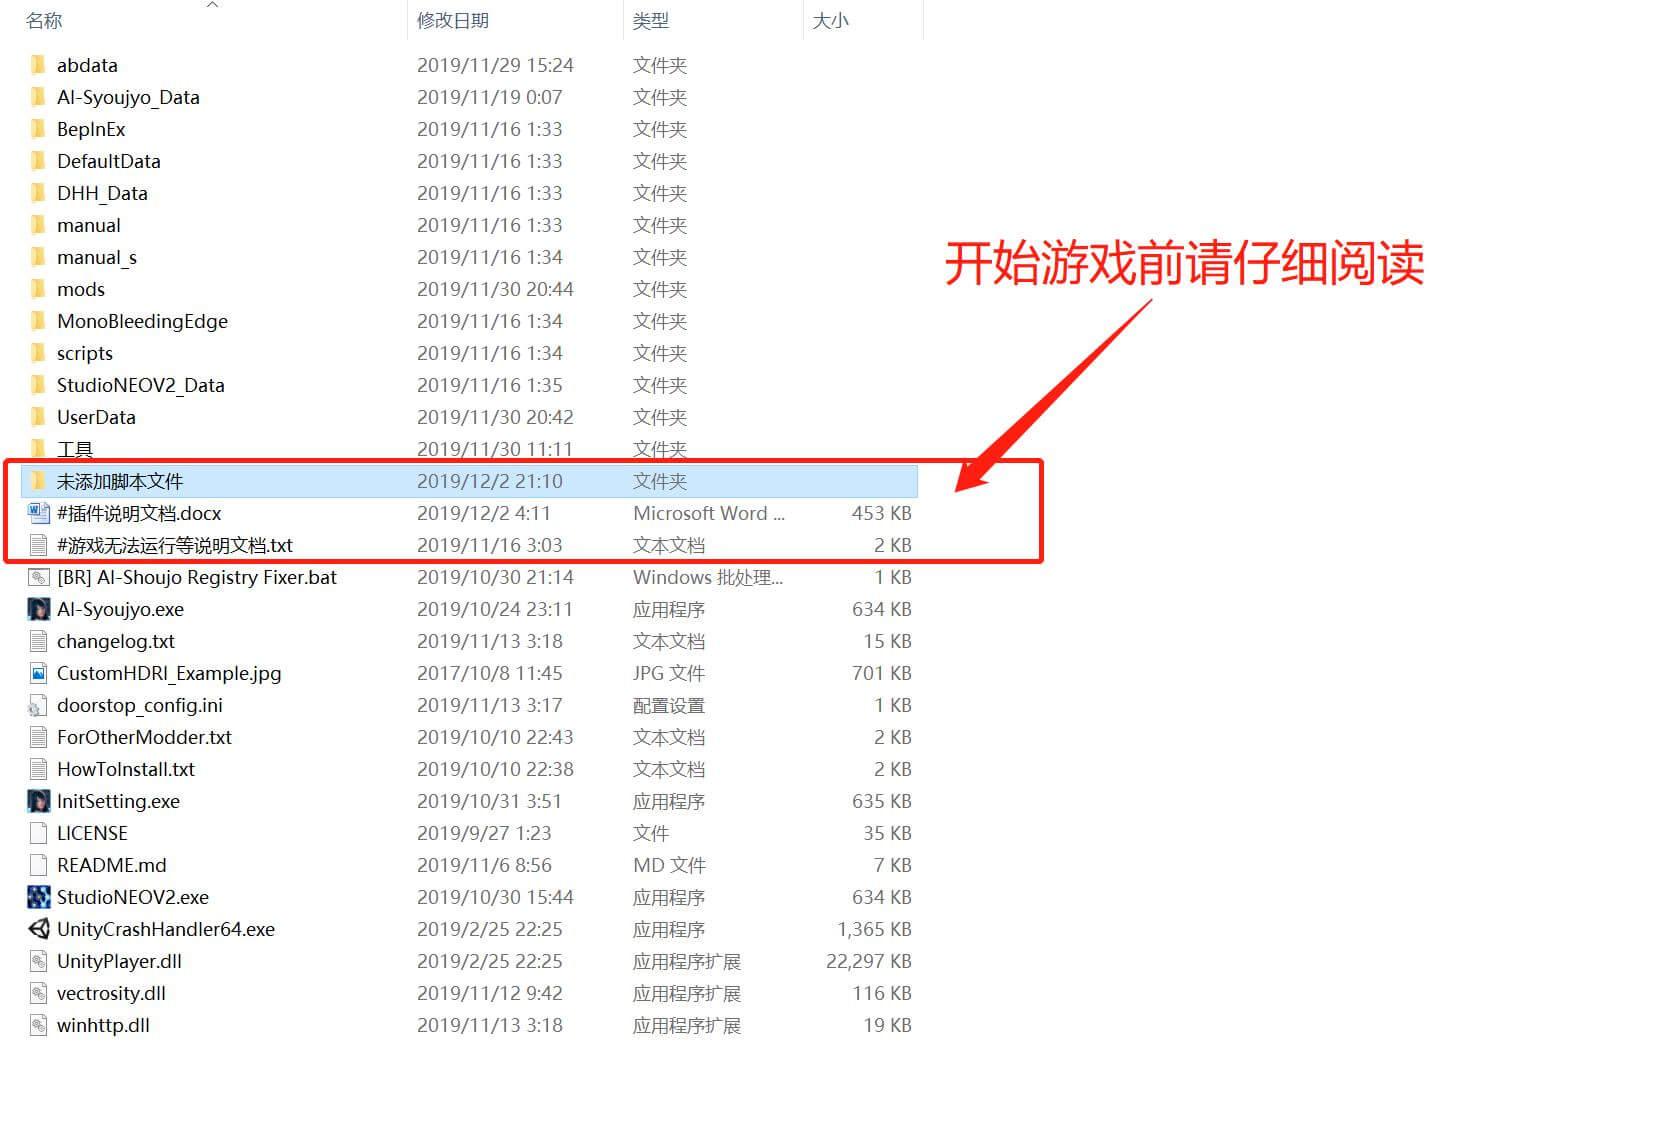 【2019.12.23】AI少女 jy144483 V1.05整合版+1.06最新版+大型整合包